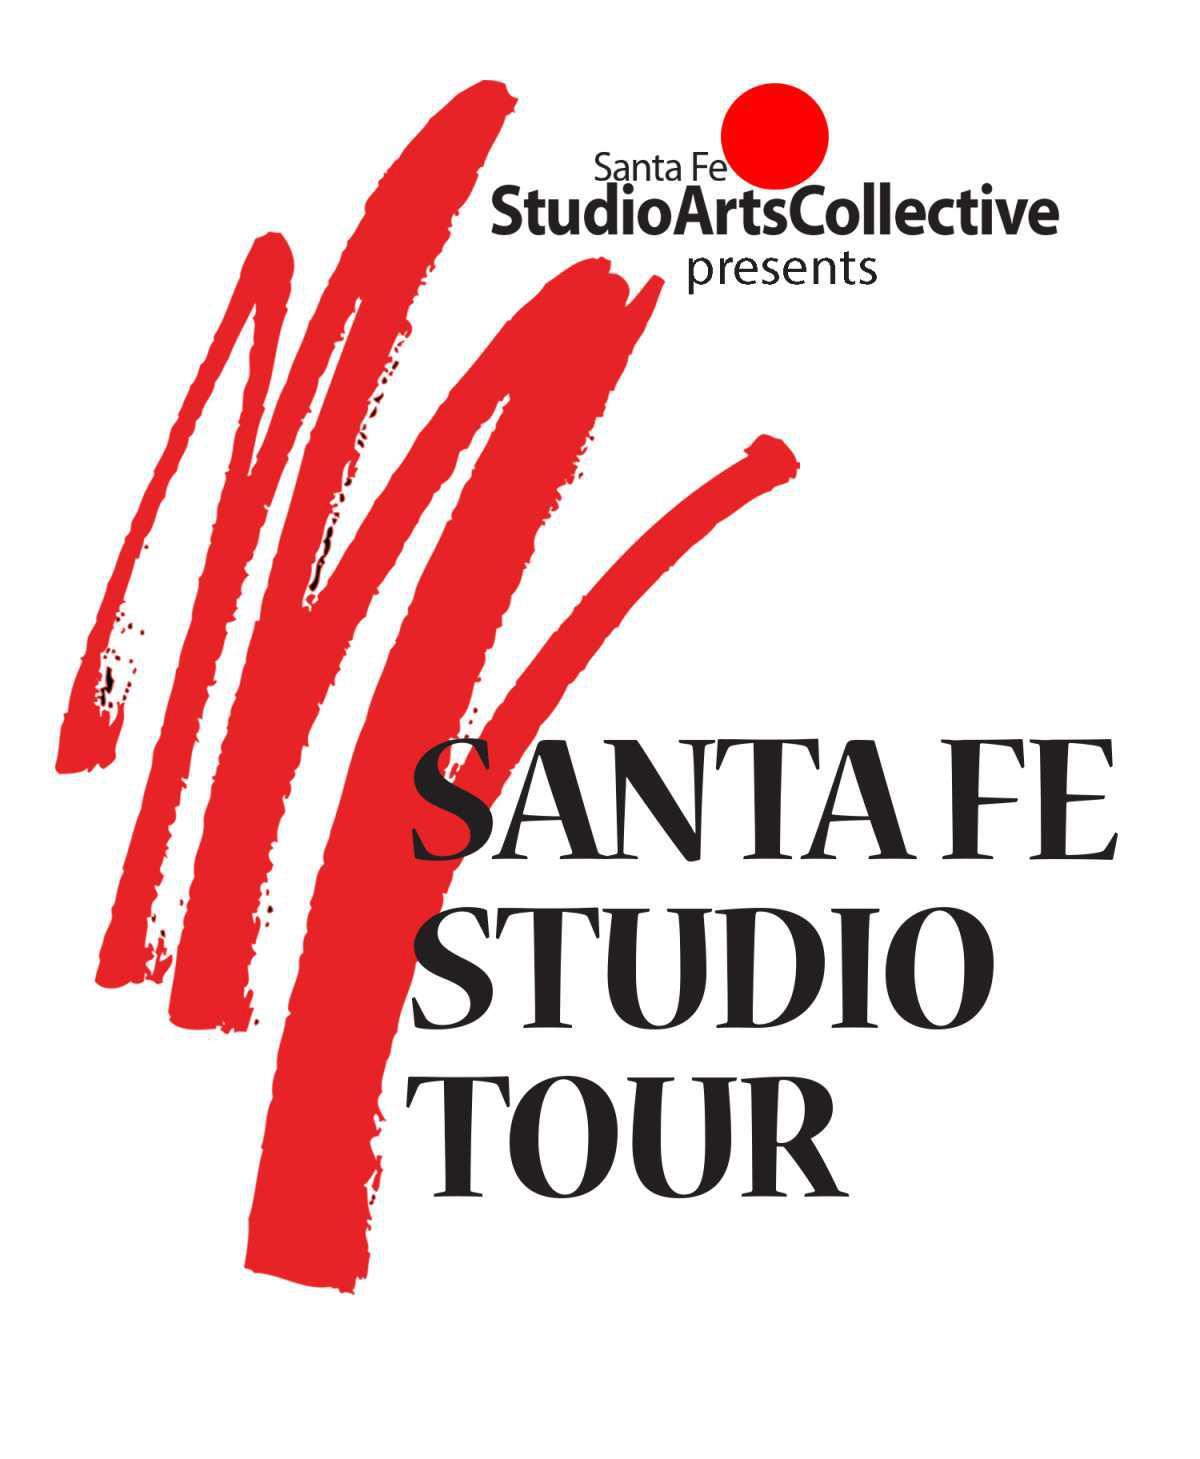 About the Santa Fe Studio Tour - Artists